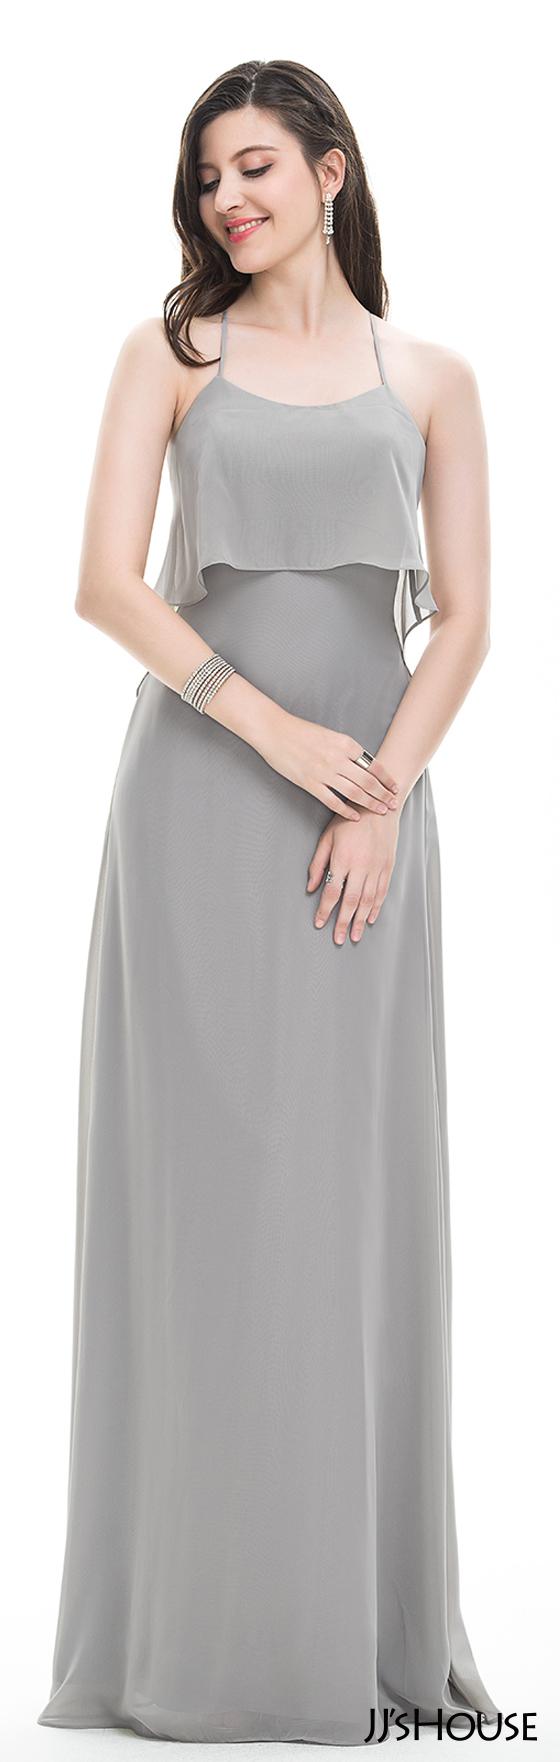 Alineprincess scoop neck floorlength chiffon prom dresses